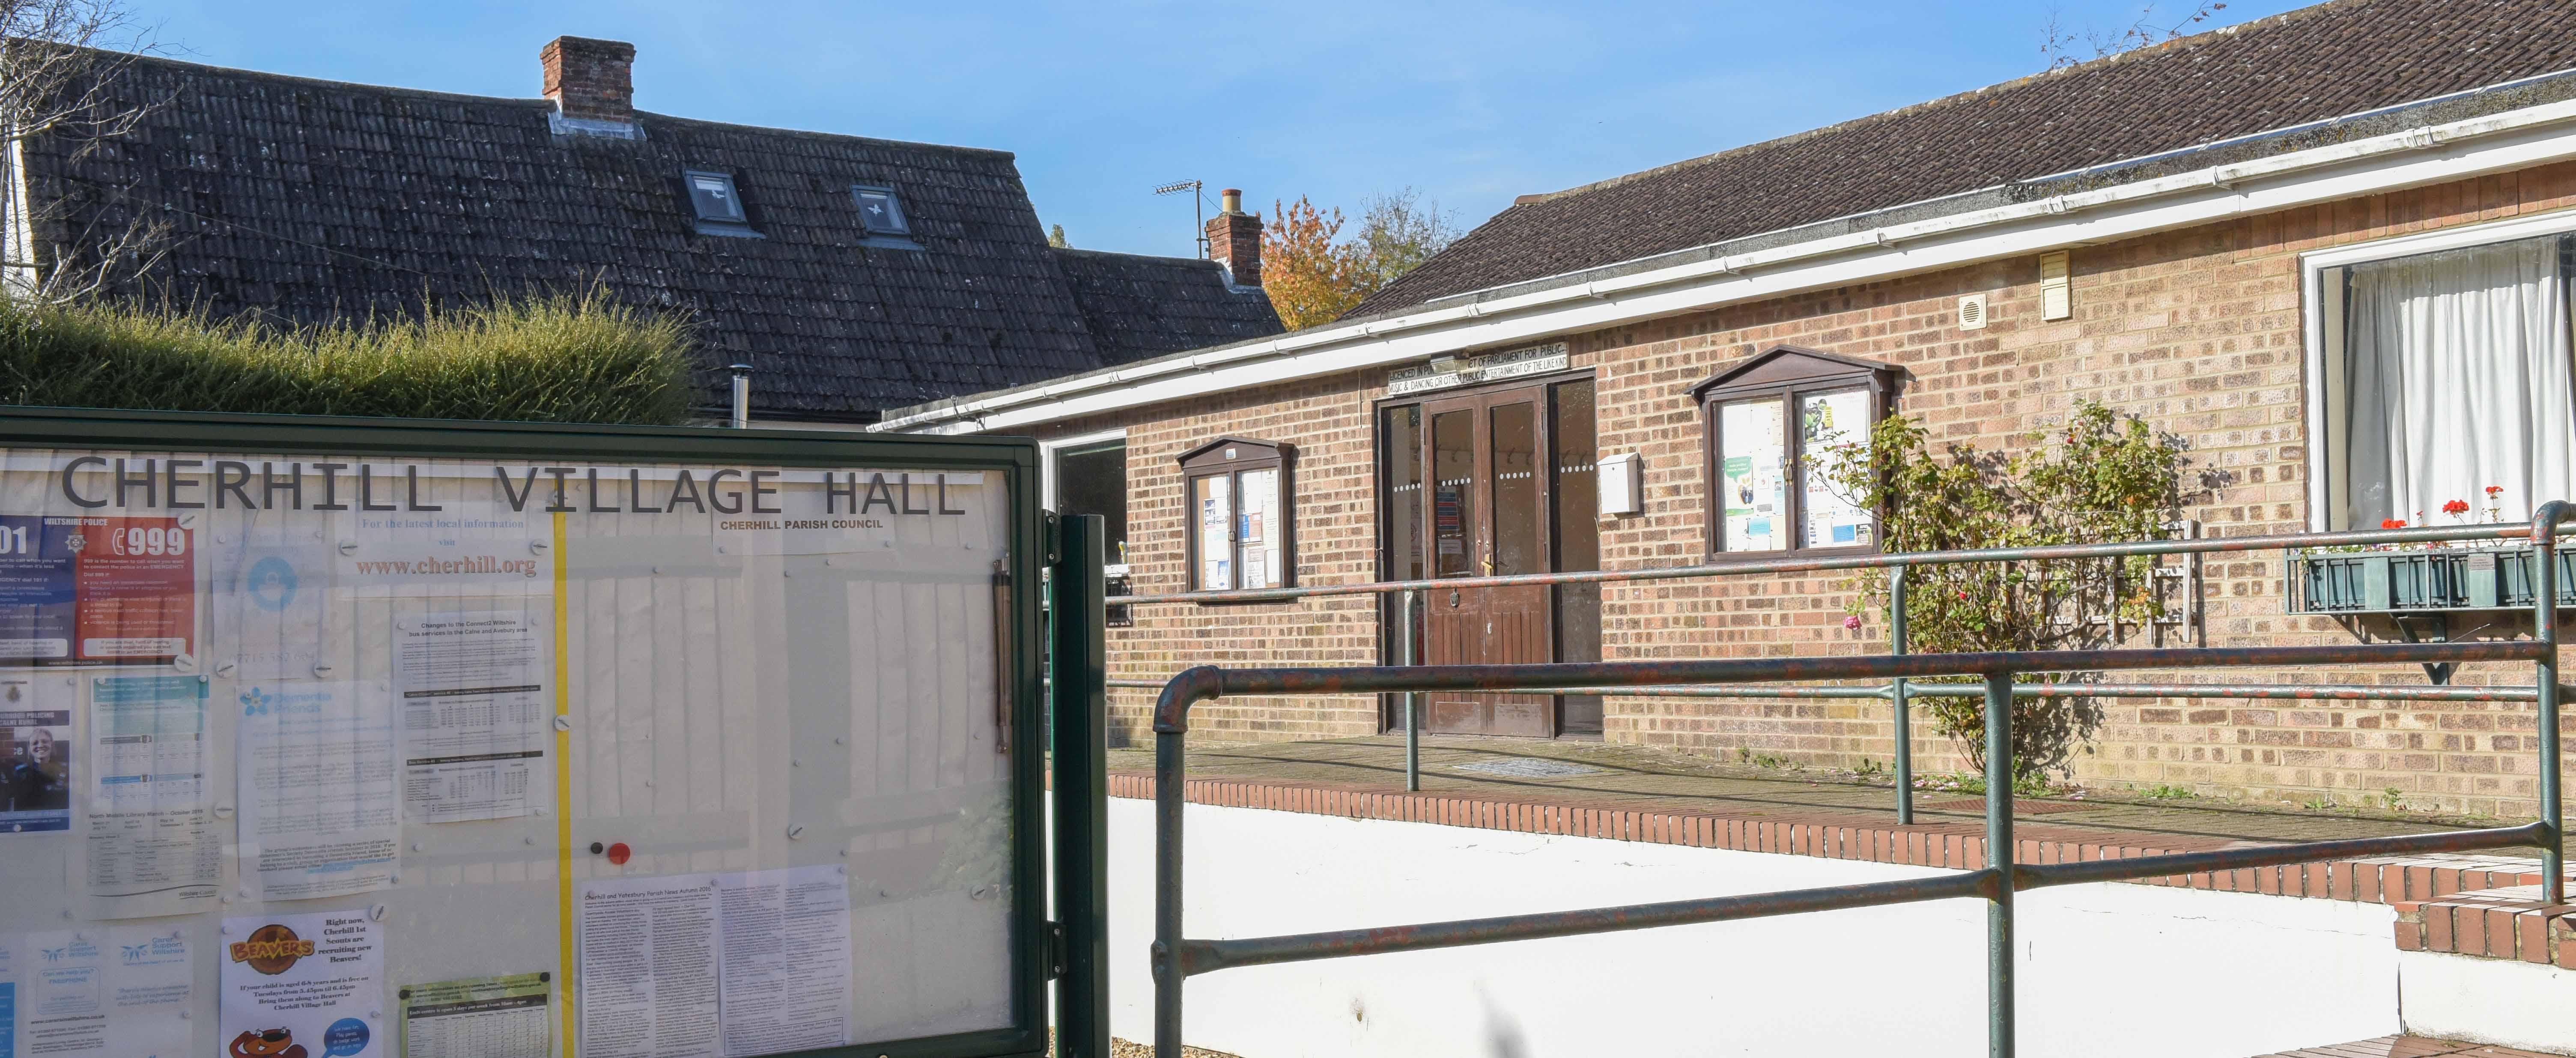 Cherhill Village Hall